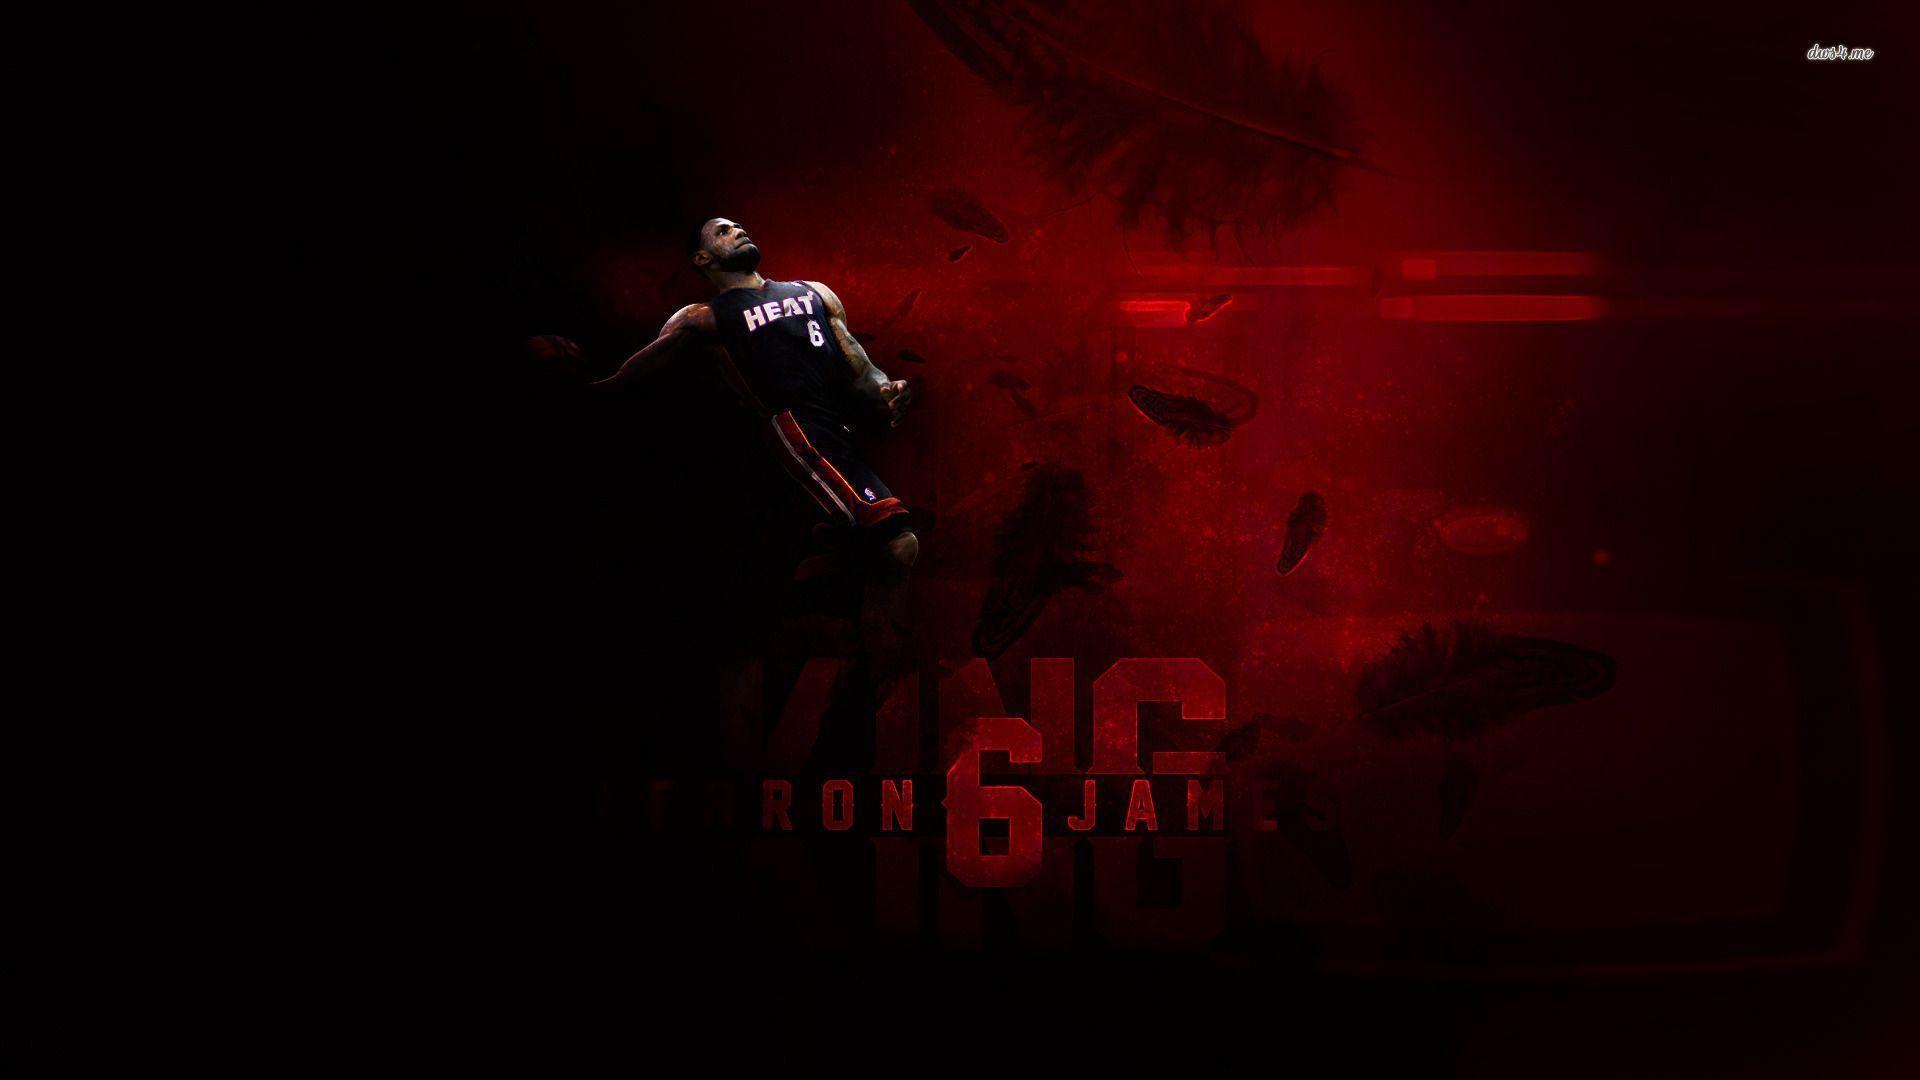 lebron james logo wallpaper - photo #19